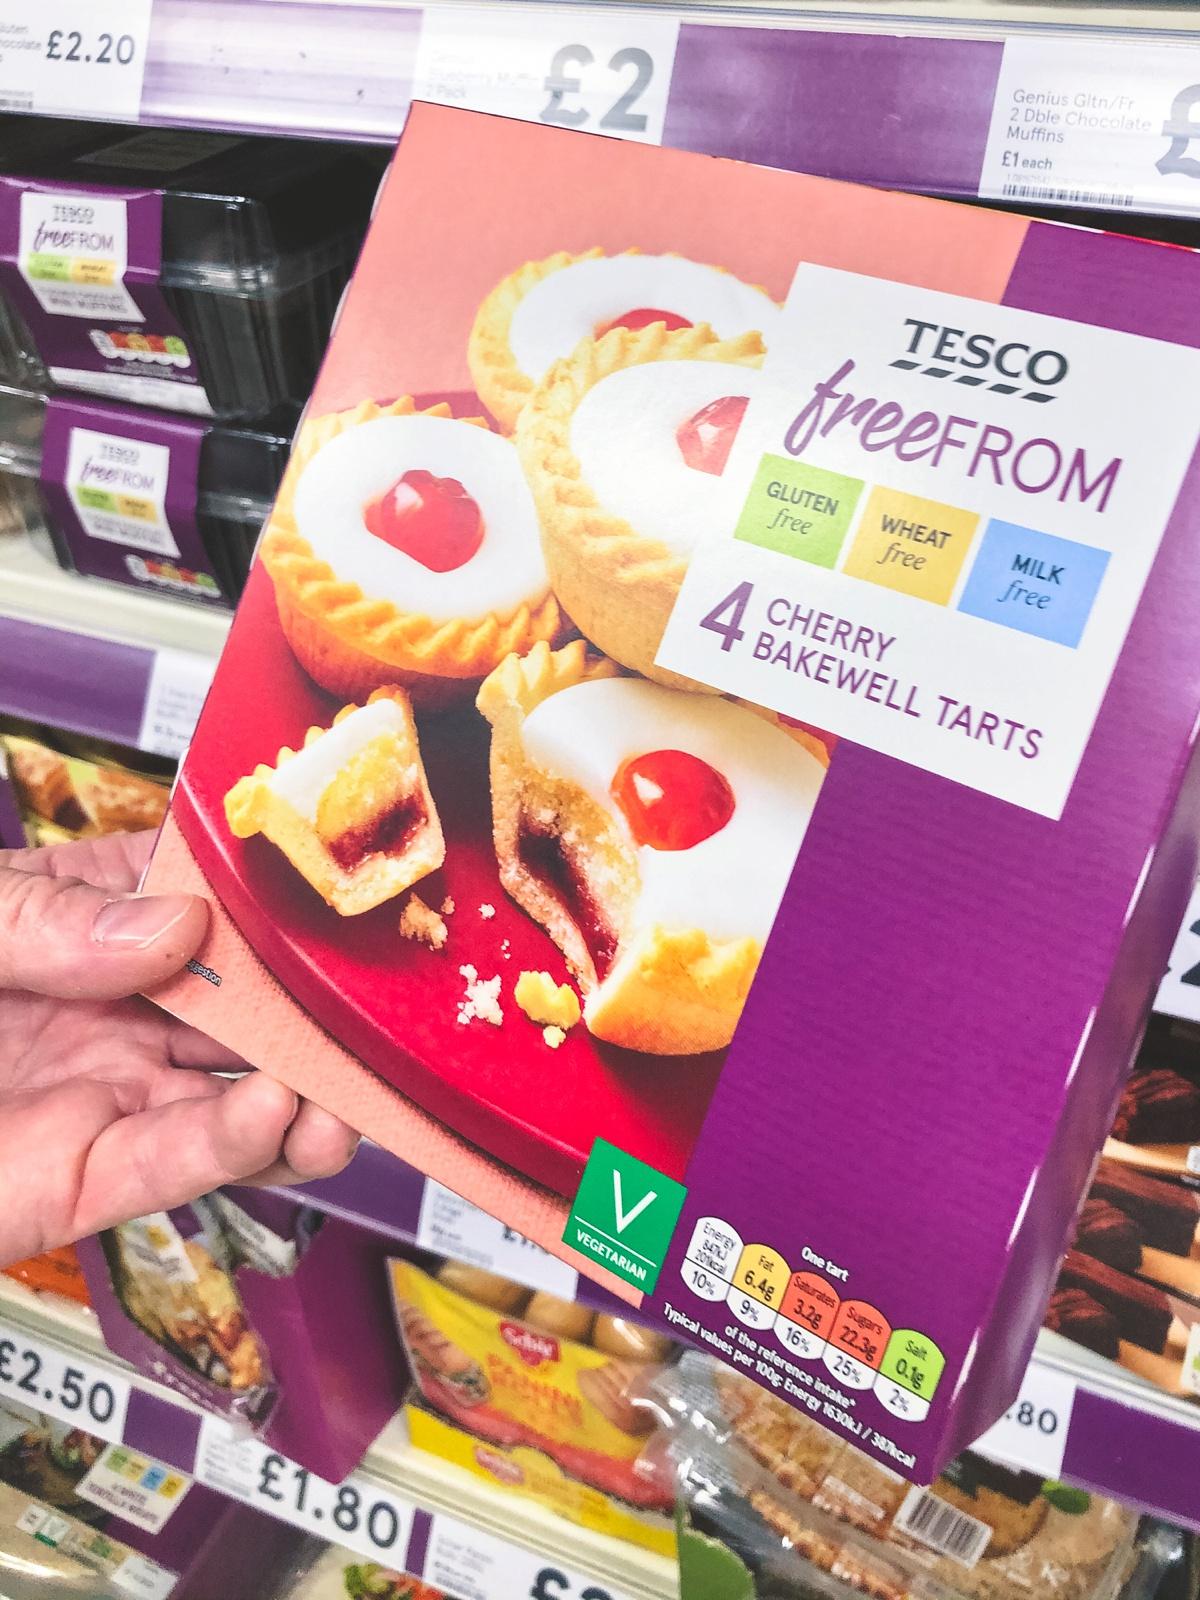 Gluten free cherry bakewell tarts from Tesco